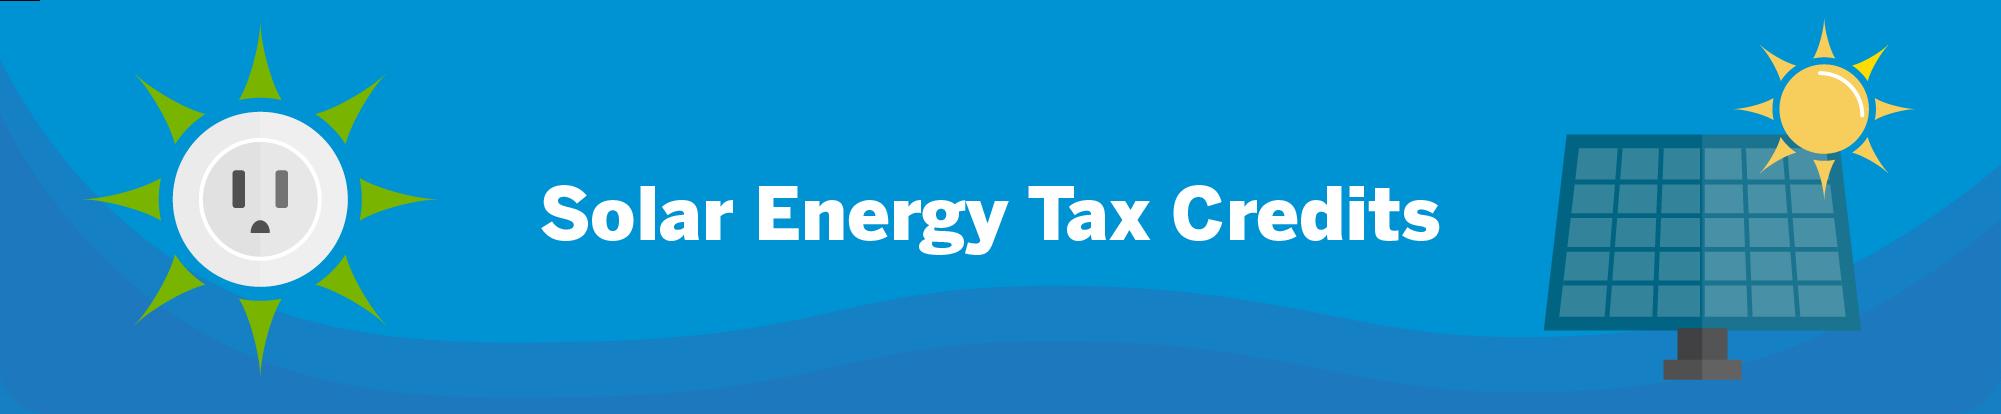 Solar energy tax credits